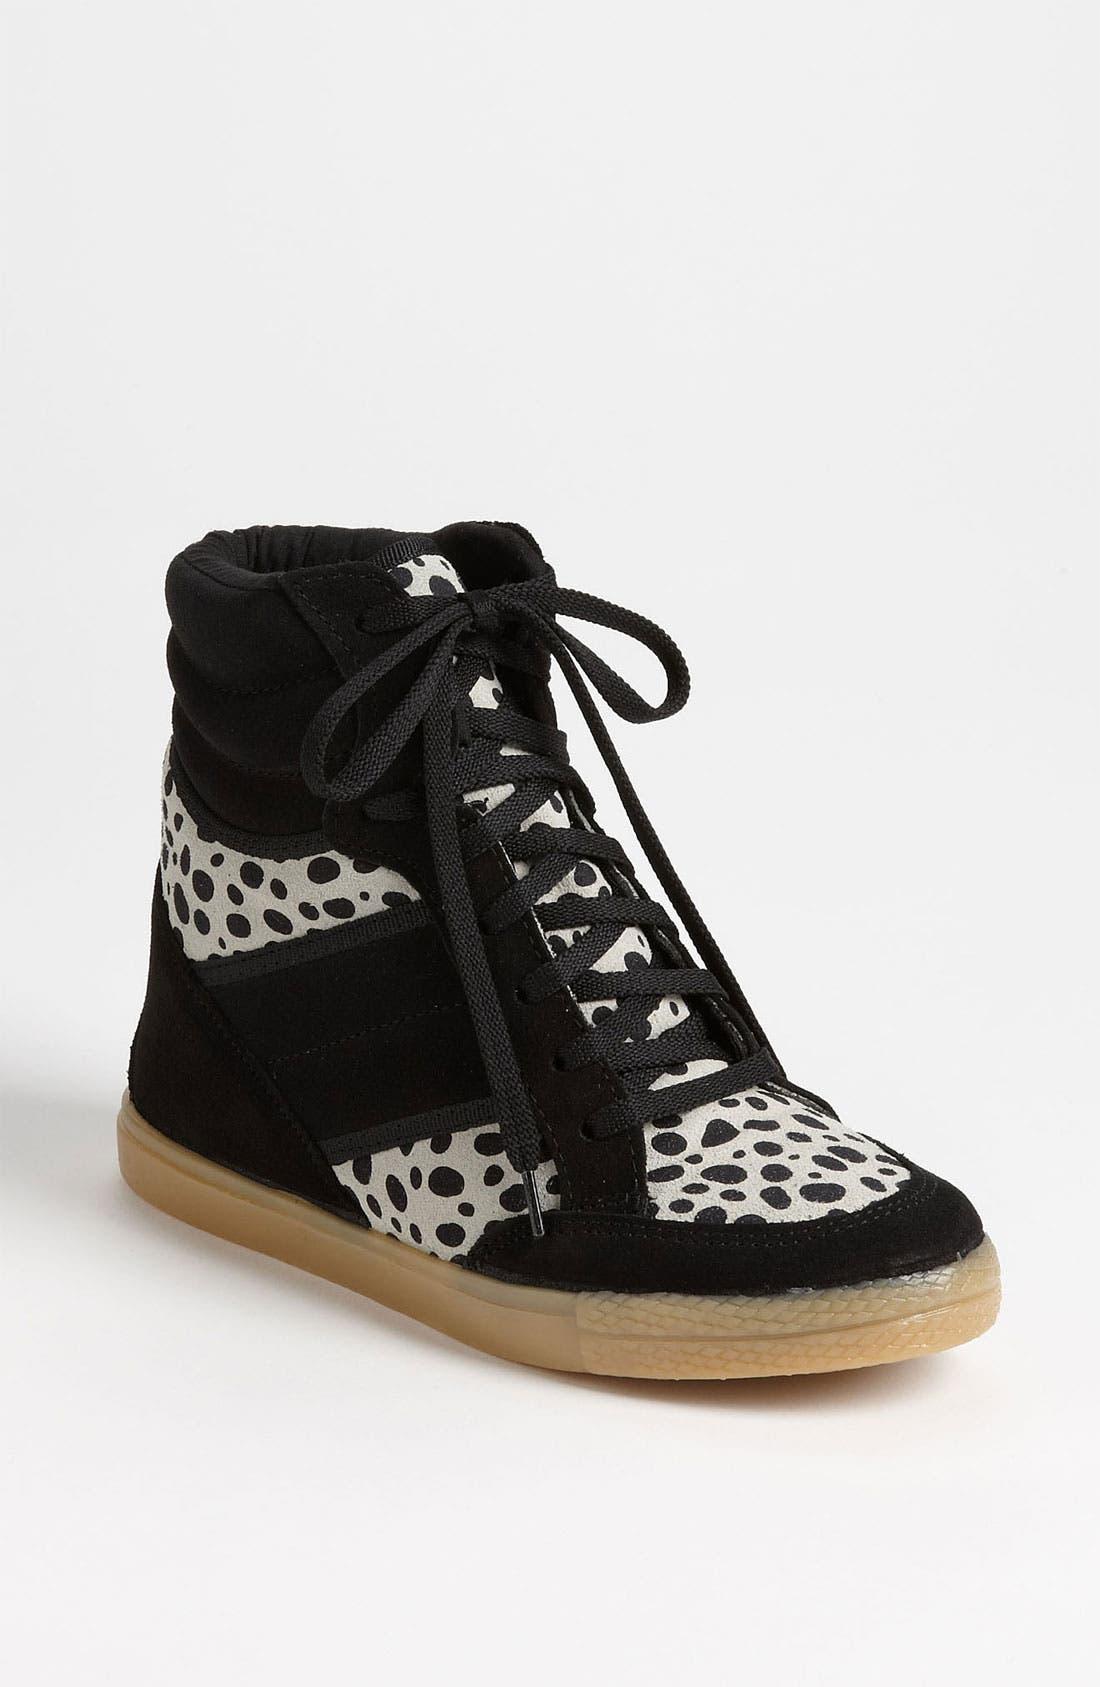 Alternate Image 1 Selected - Topshop 'Acrobatics - Dalmation' Sneaker